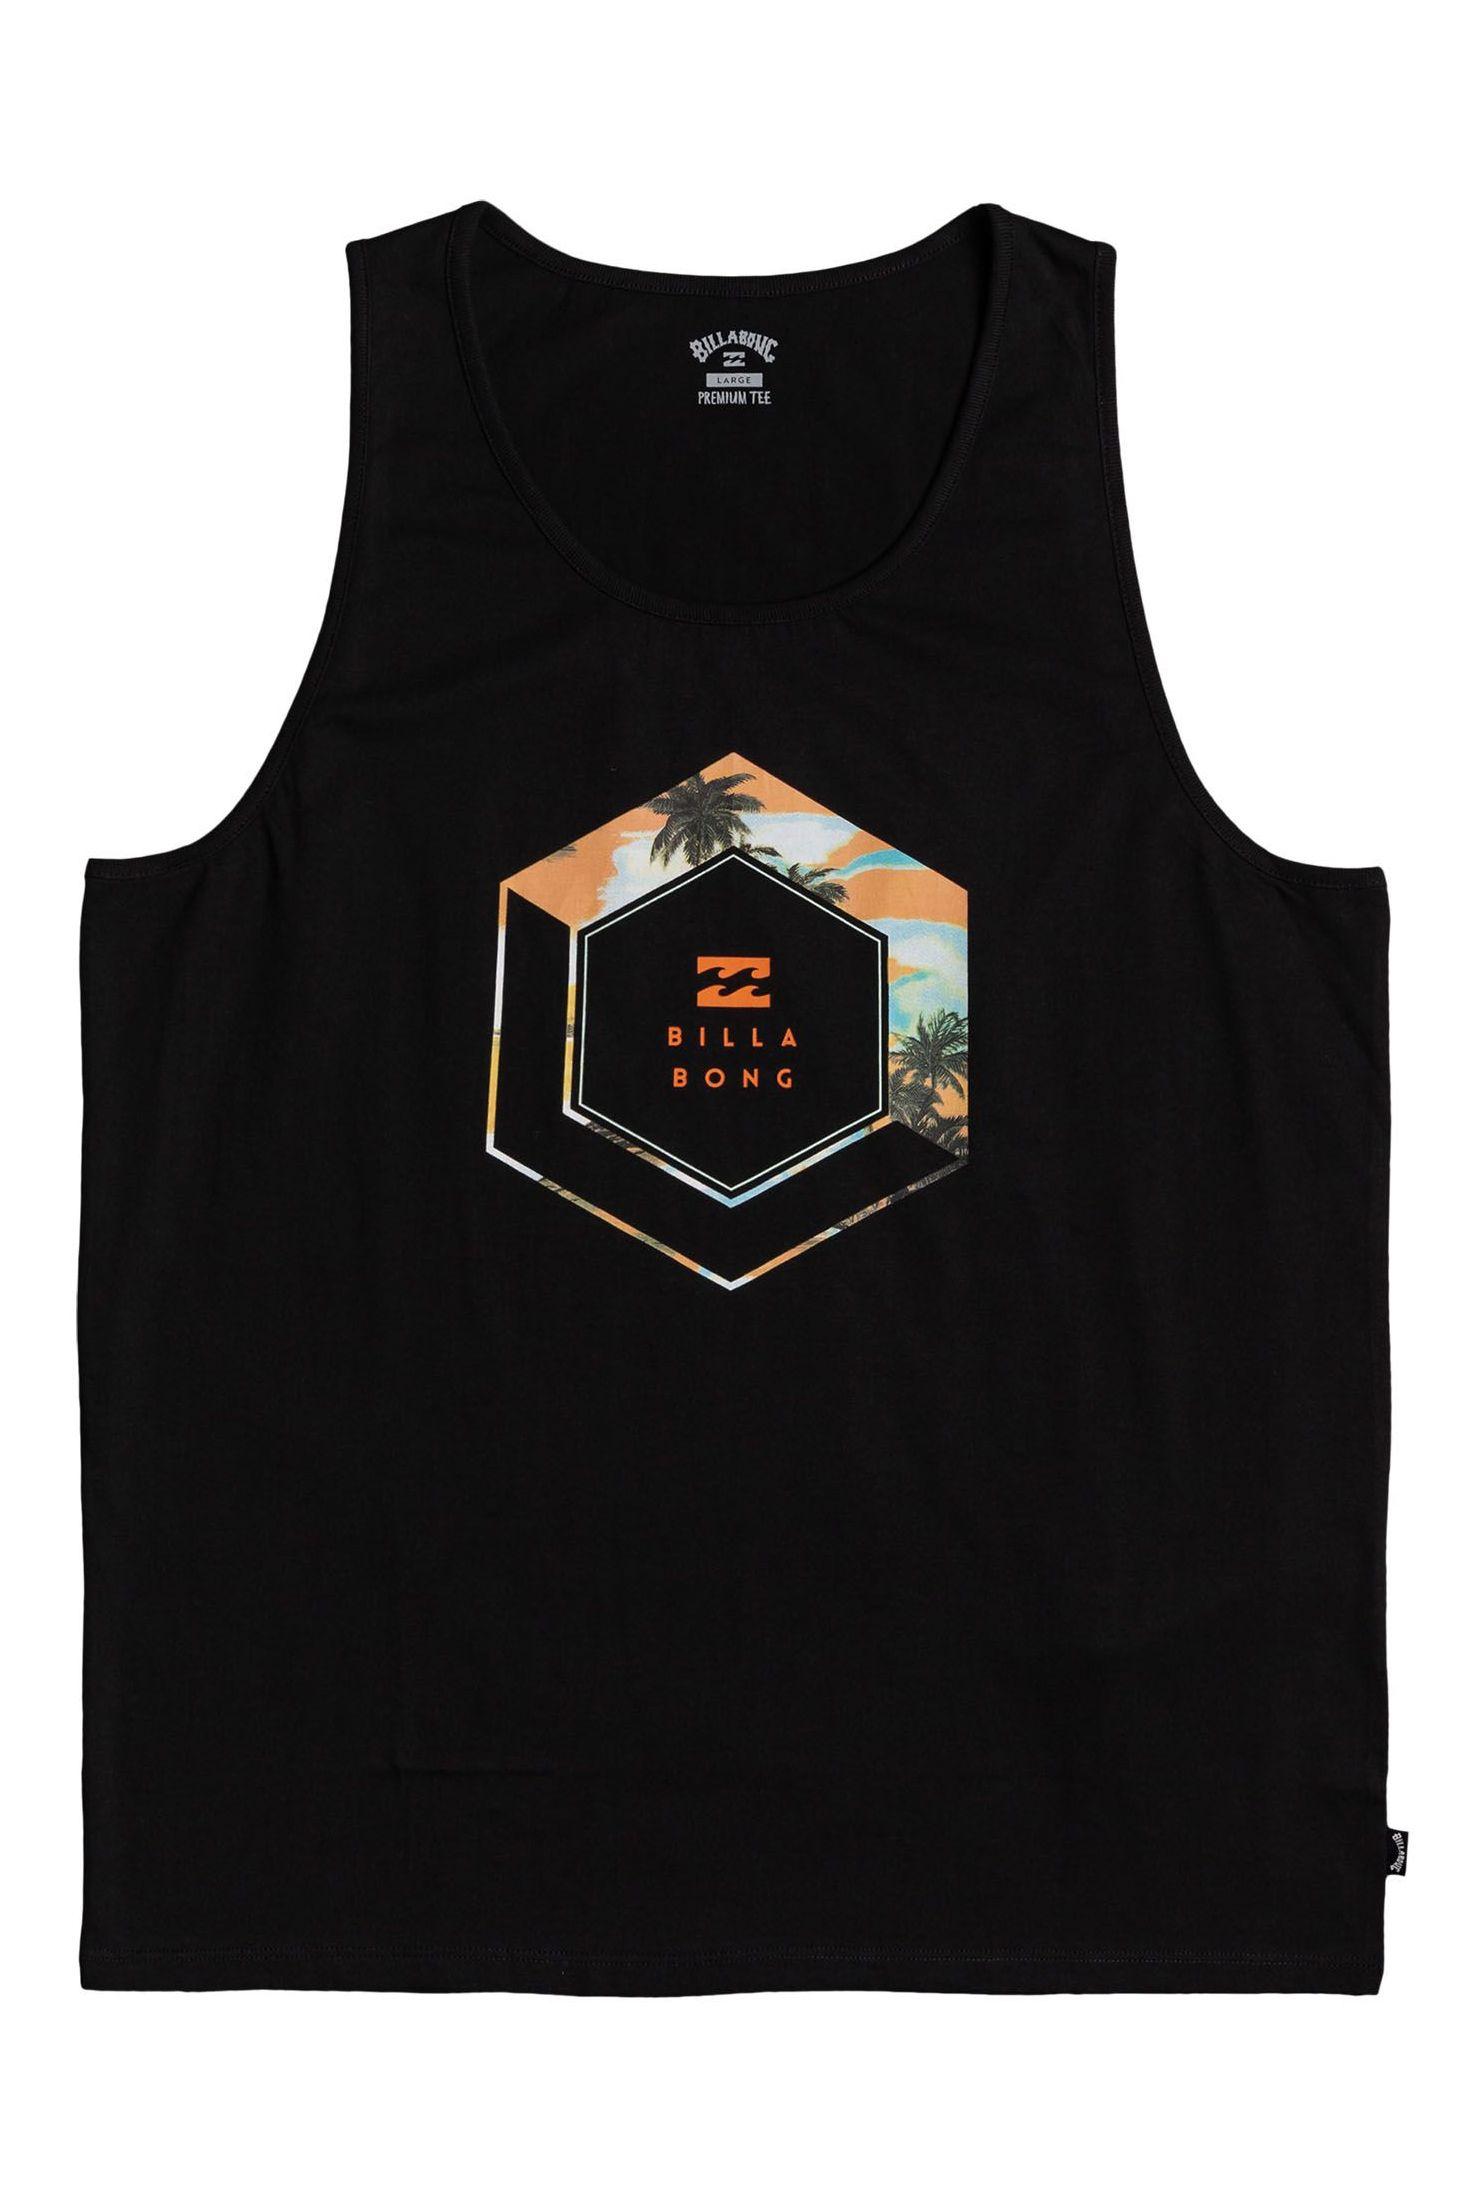 Billabong T-Shirt Tank Top ACCESS TANK Black